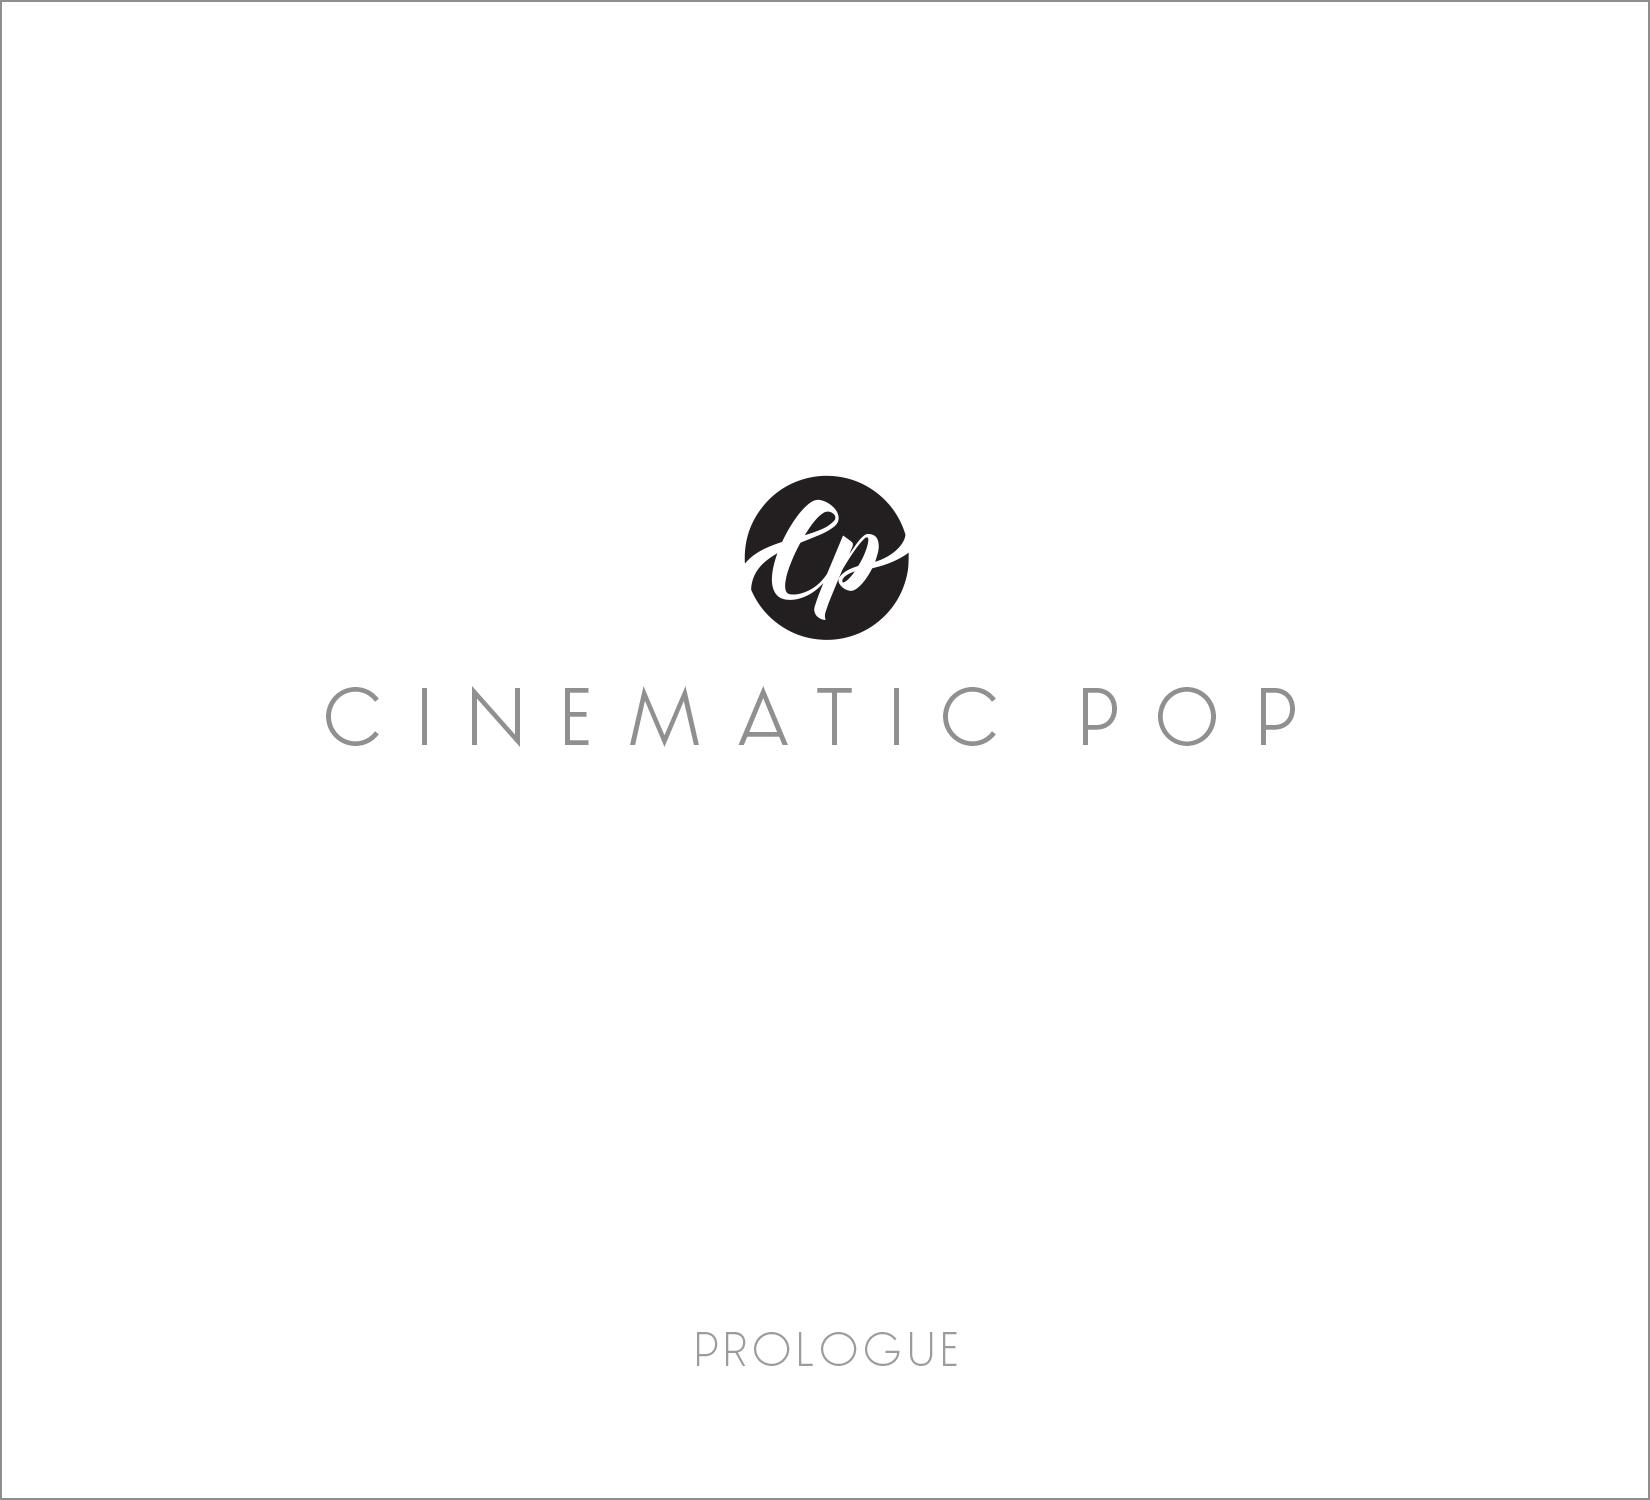 Cinematic Pop - Prologue